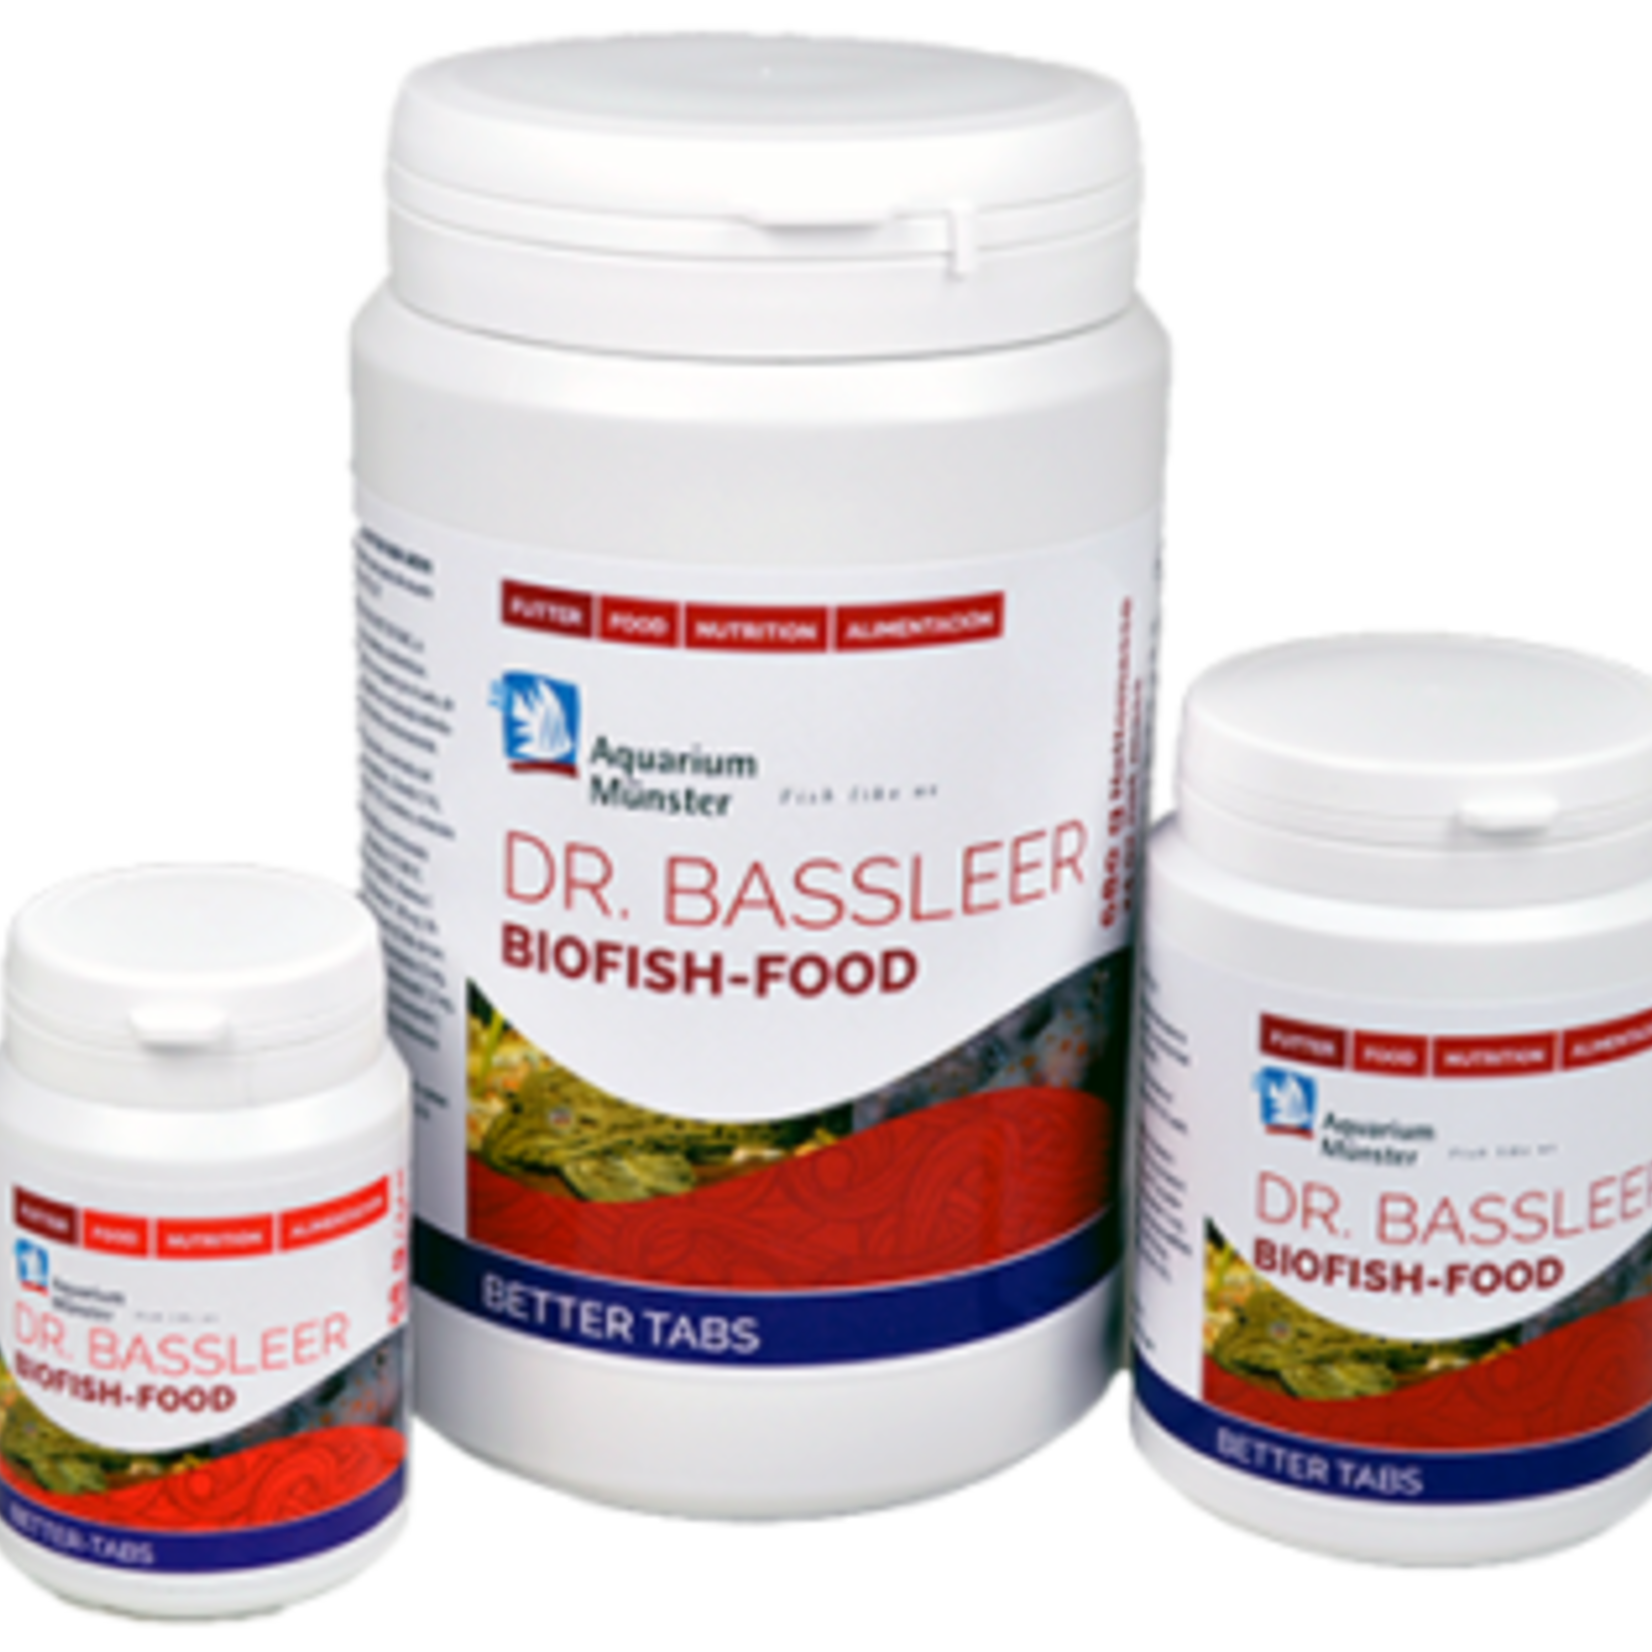 BioFishFood Dr Bassleer - Better Tabs